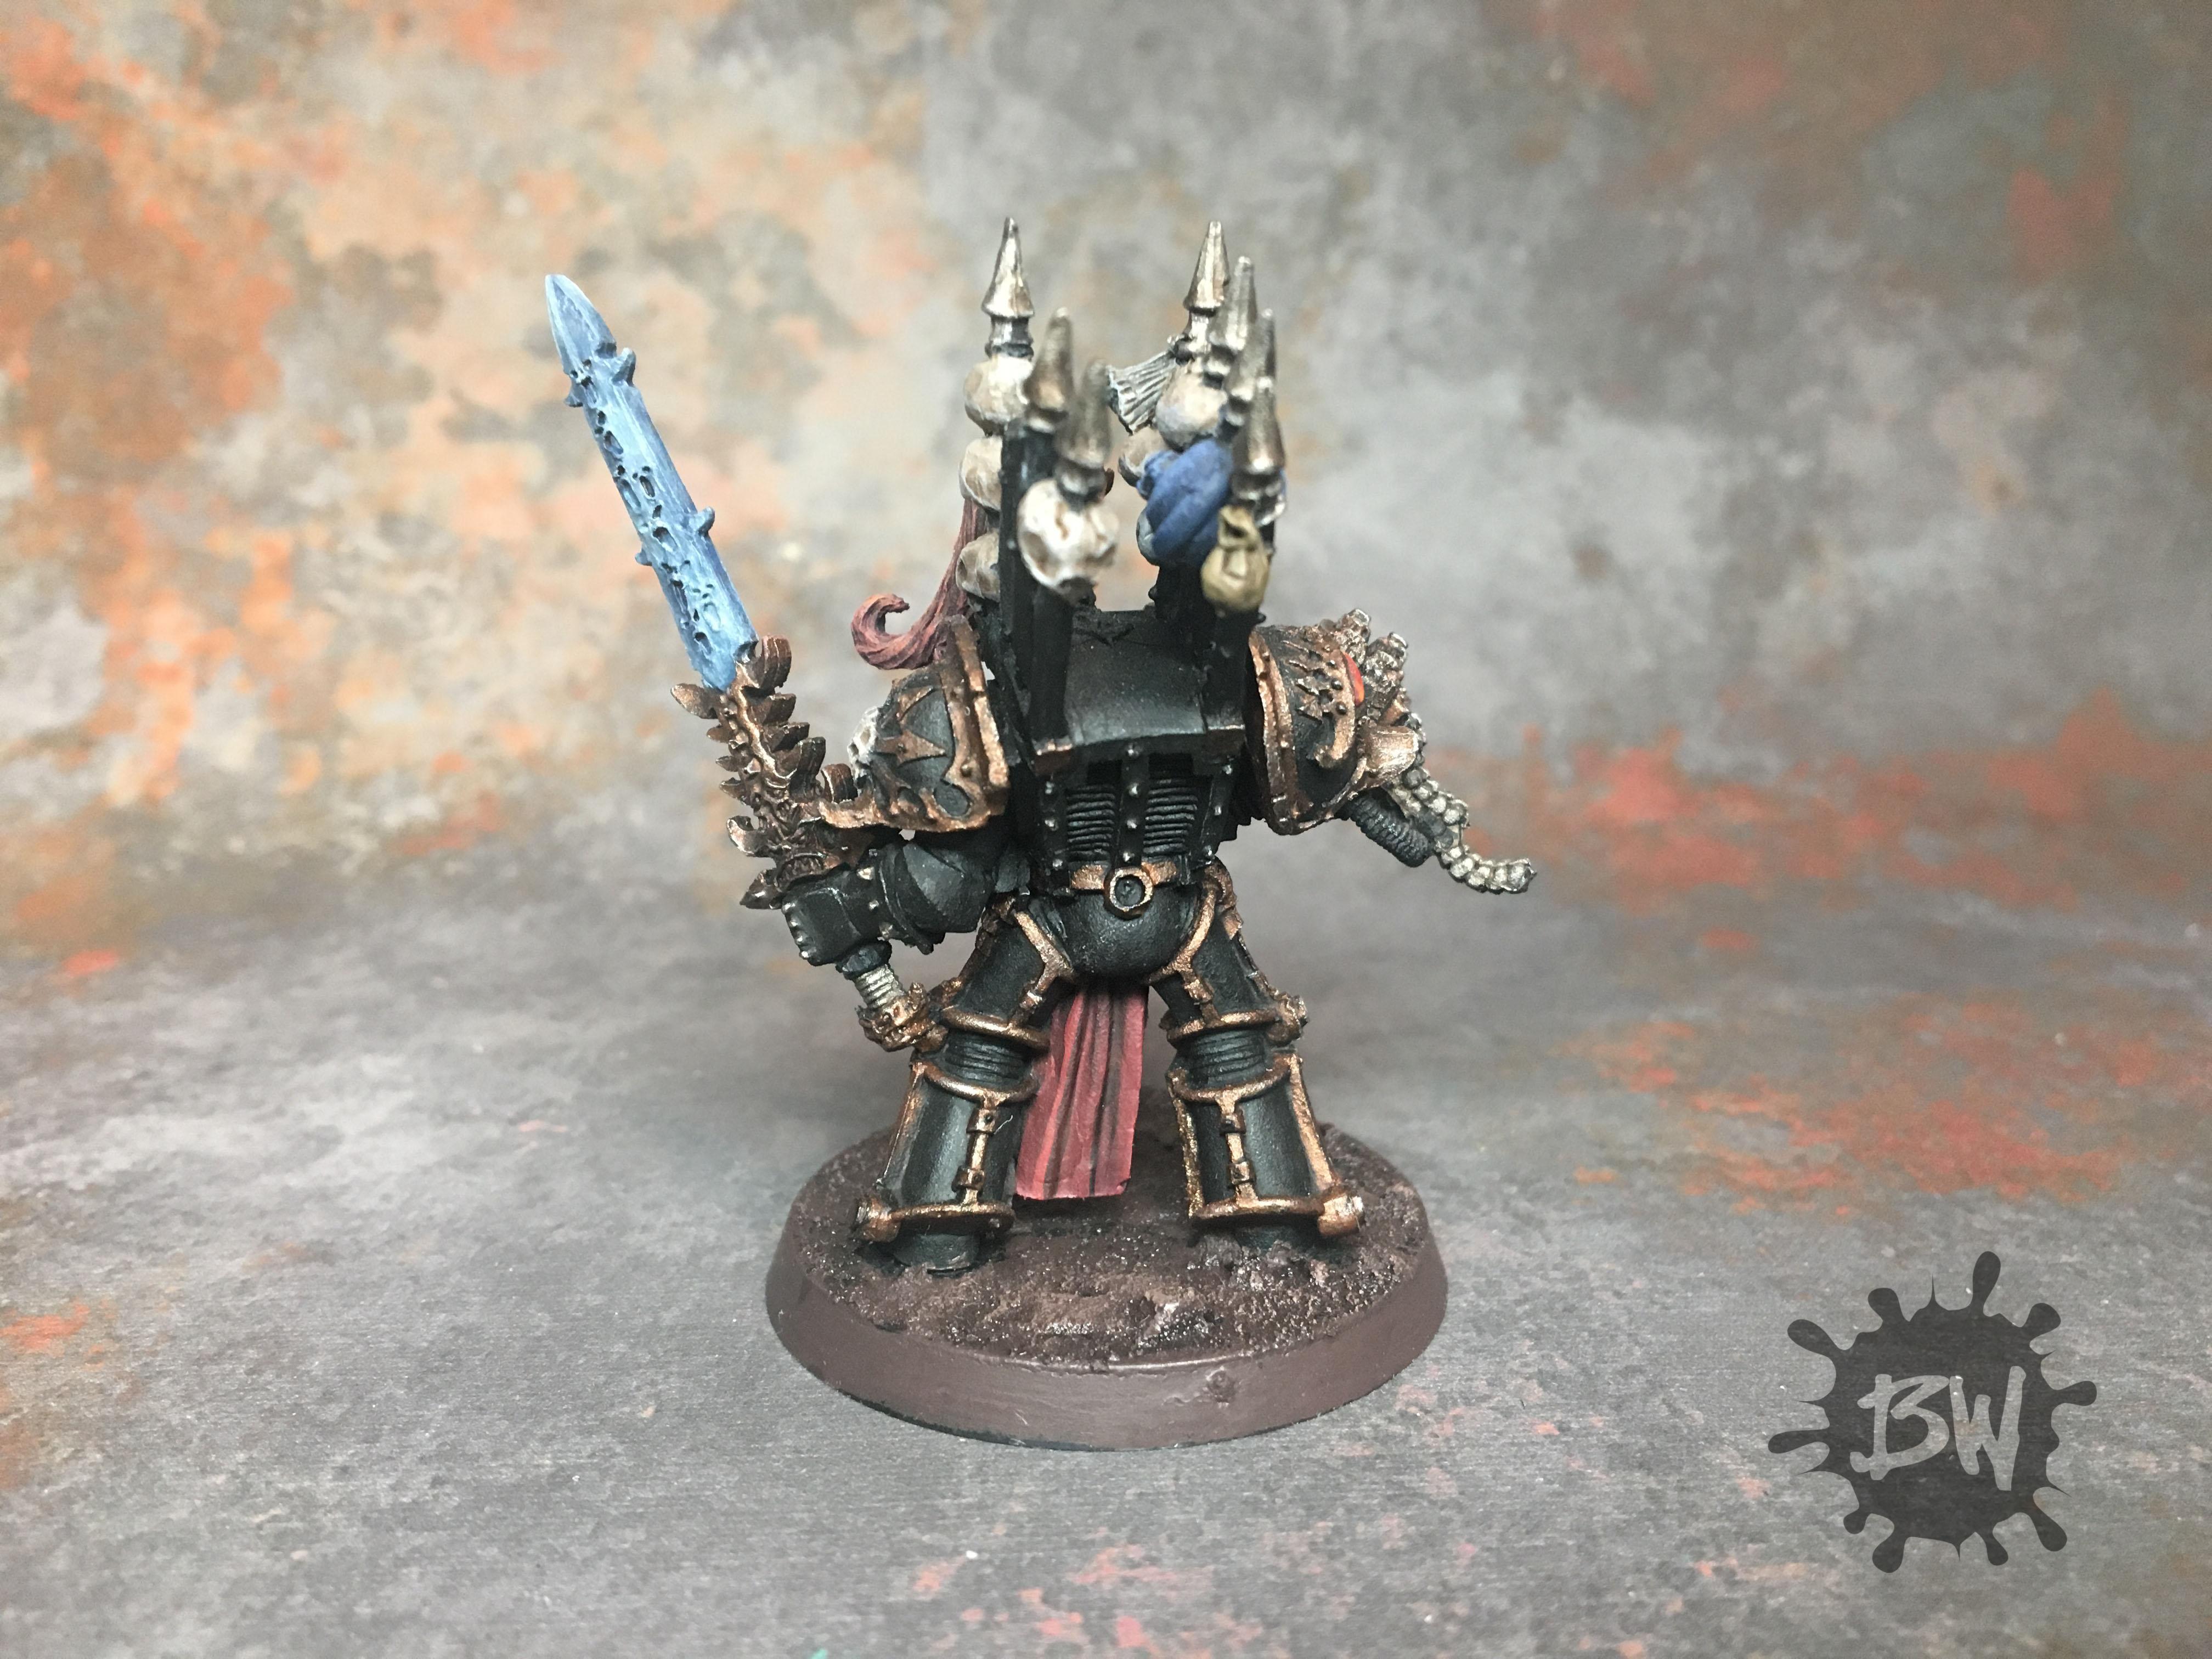 Abaddon The Despoiler, Bawpainting, Chaos, Commission, Games Workshop, Painting, Warhammer 40,000, Warhammer Fantasy